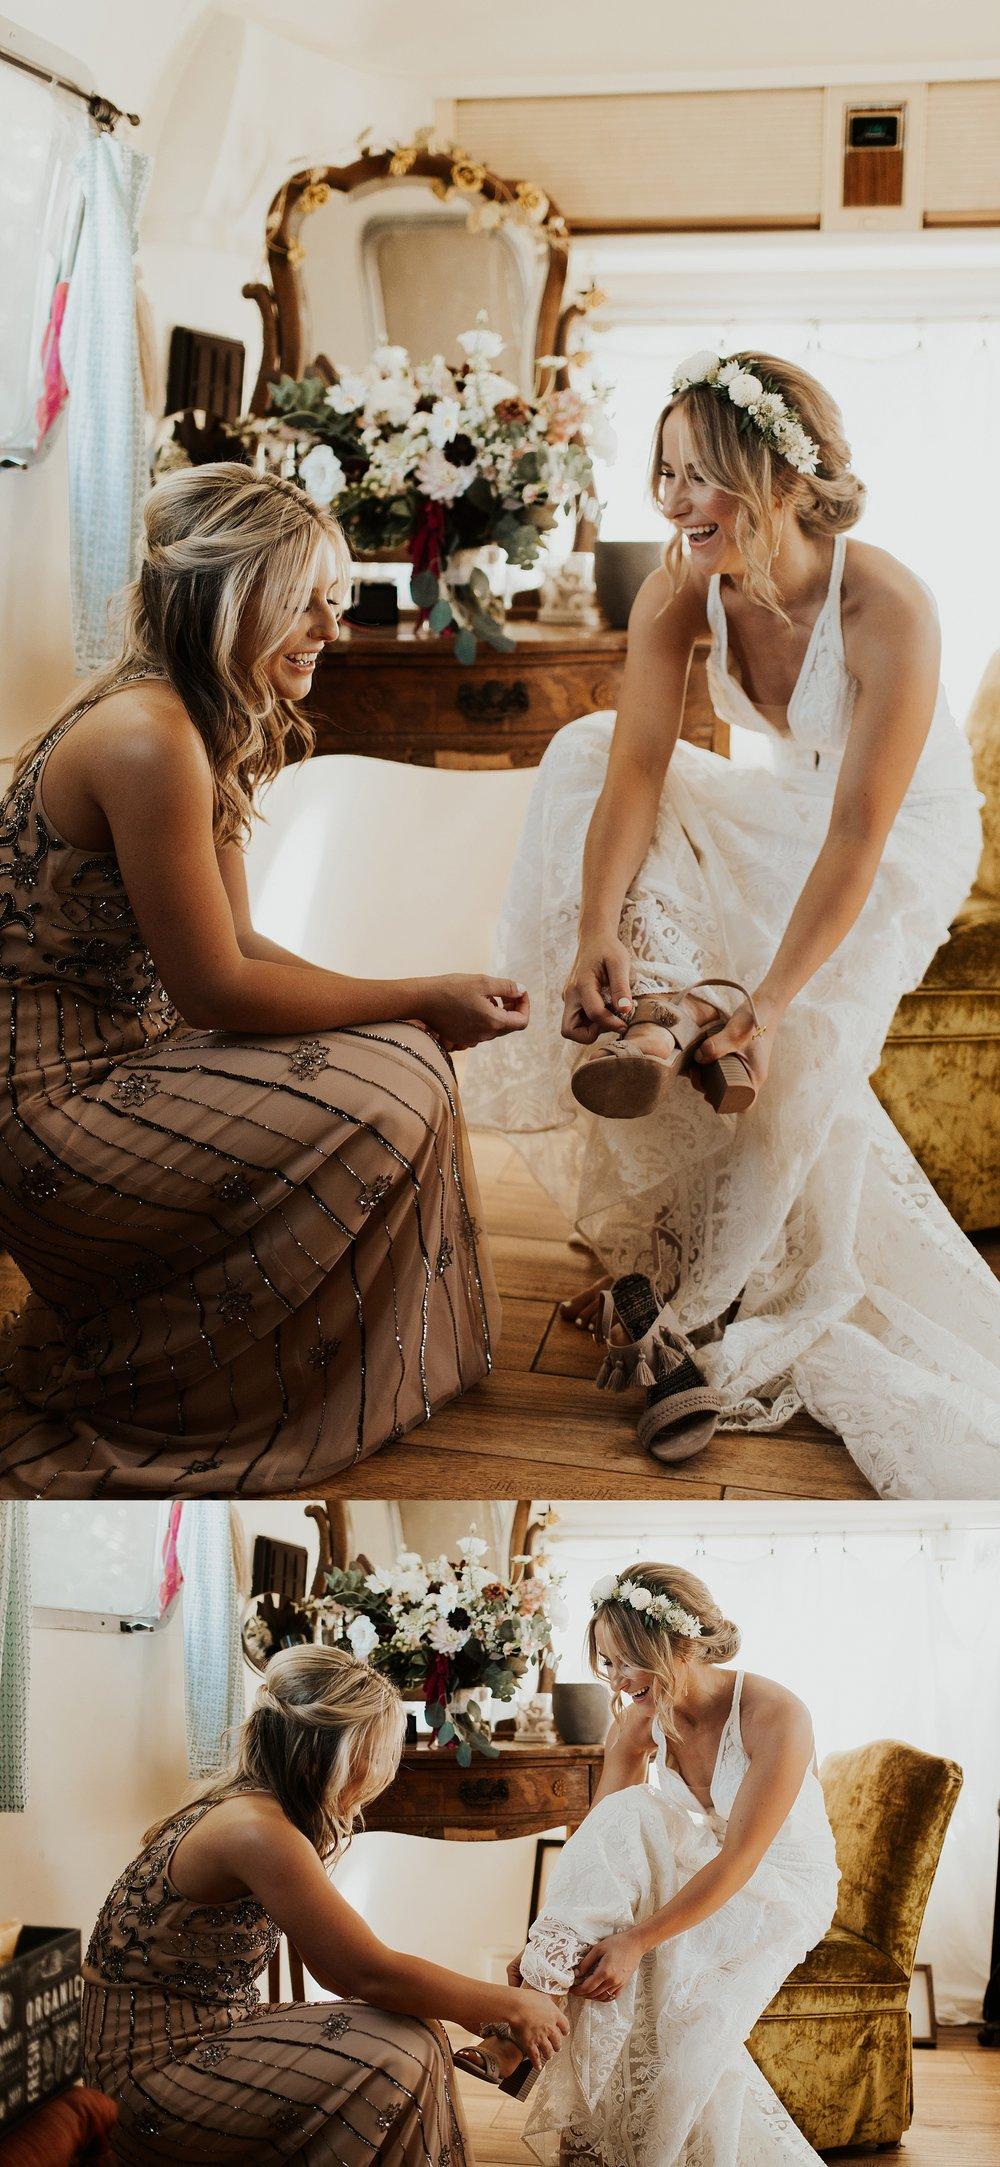 Lyons_Farmette_Wedding_Denver_Colorado_wedding006.JPG